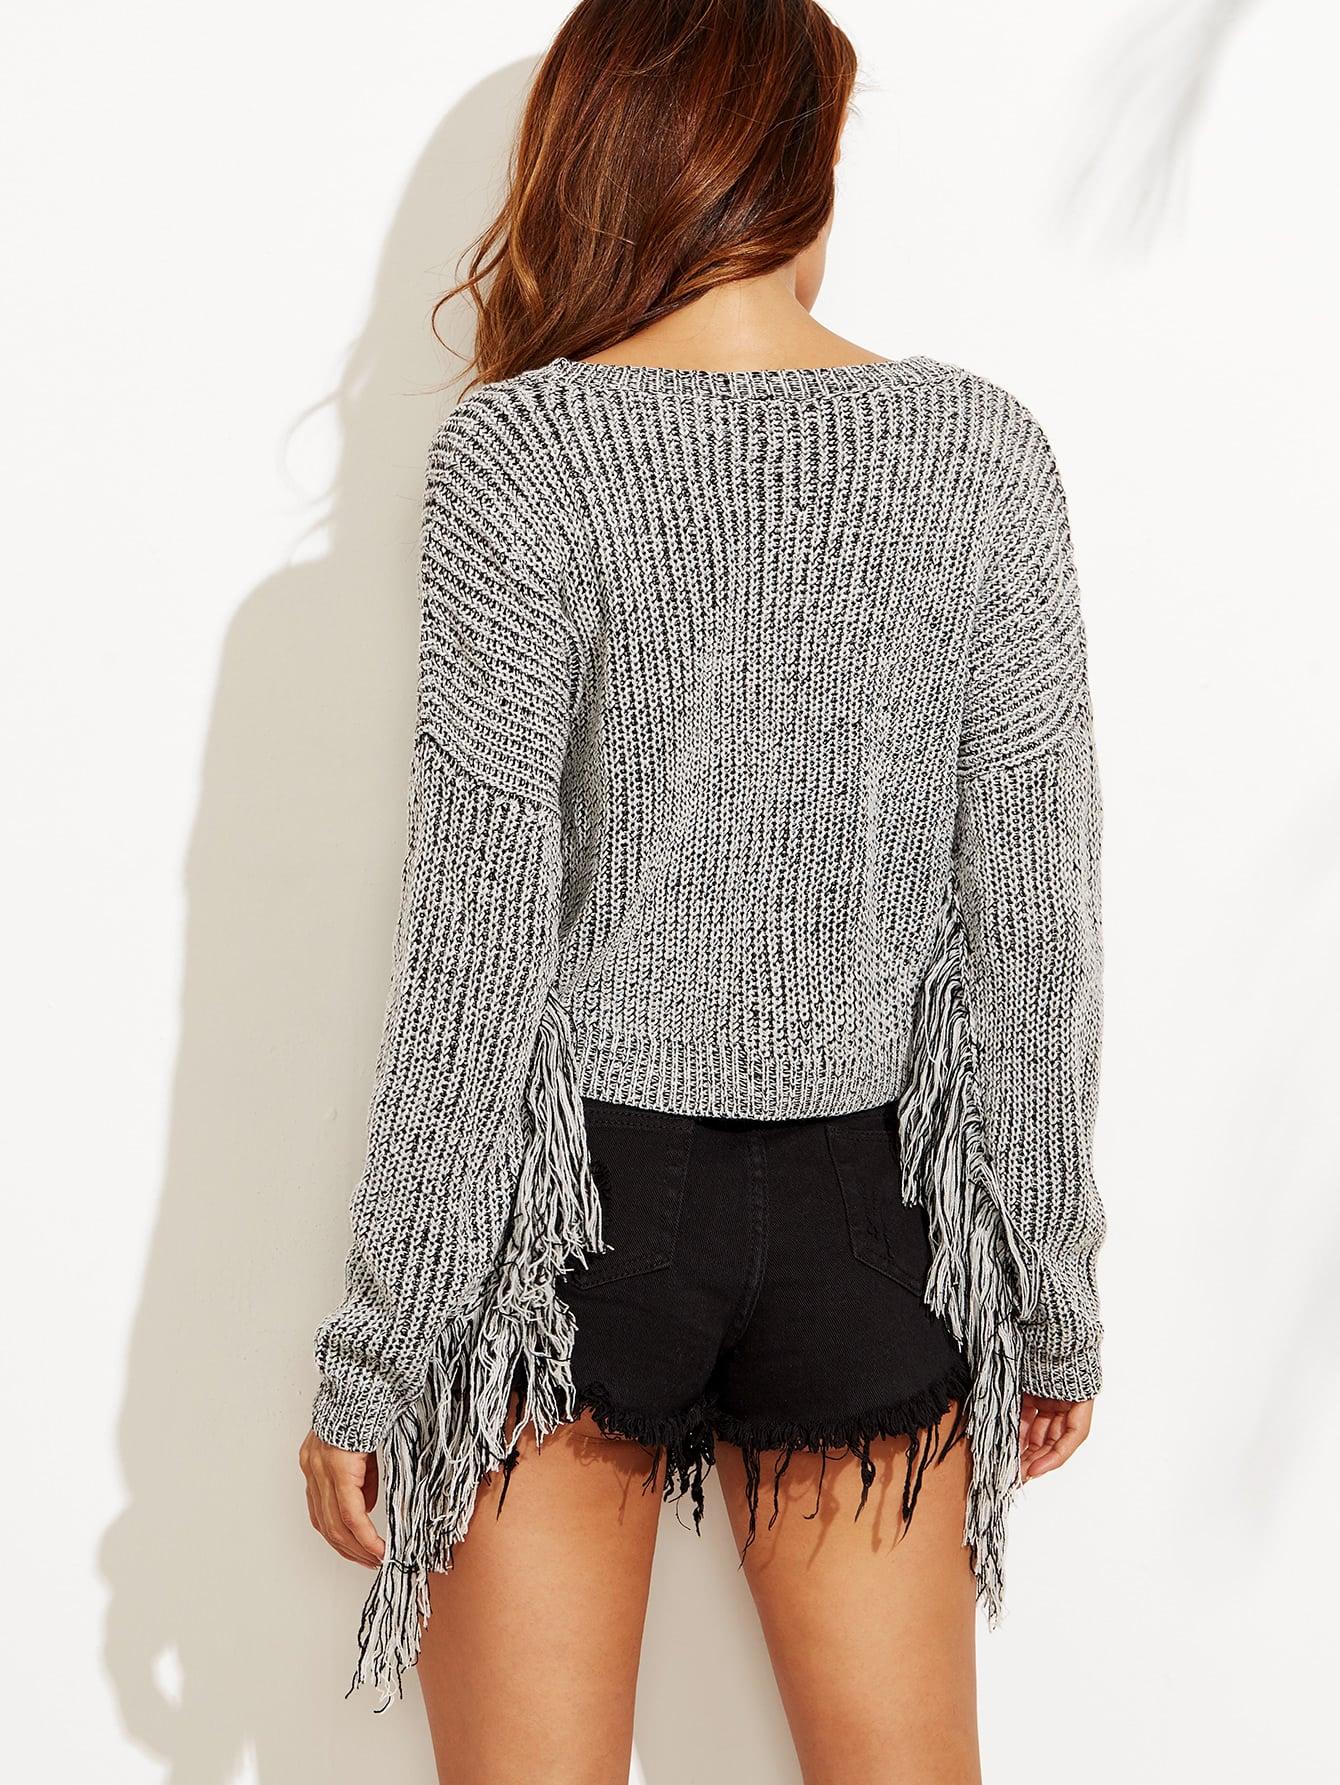 sweater160819704_2